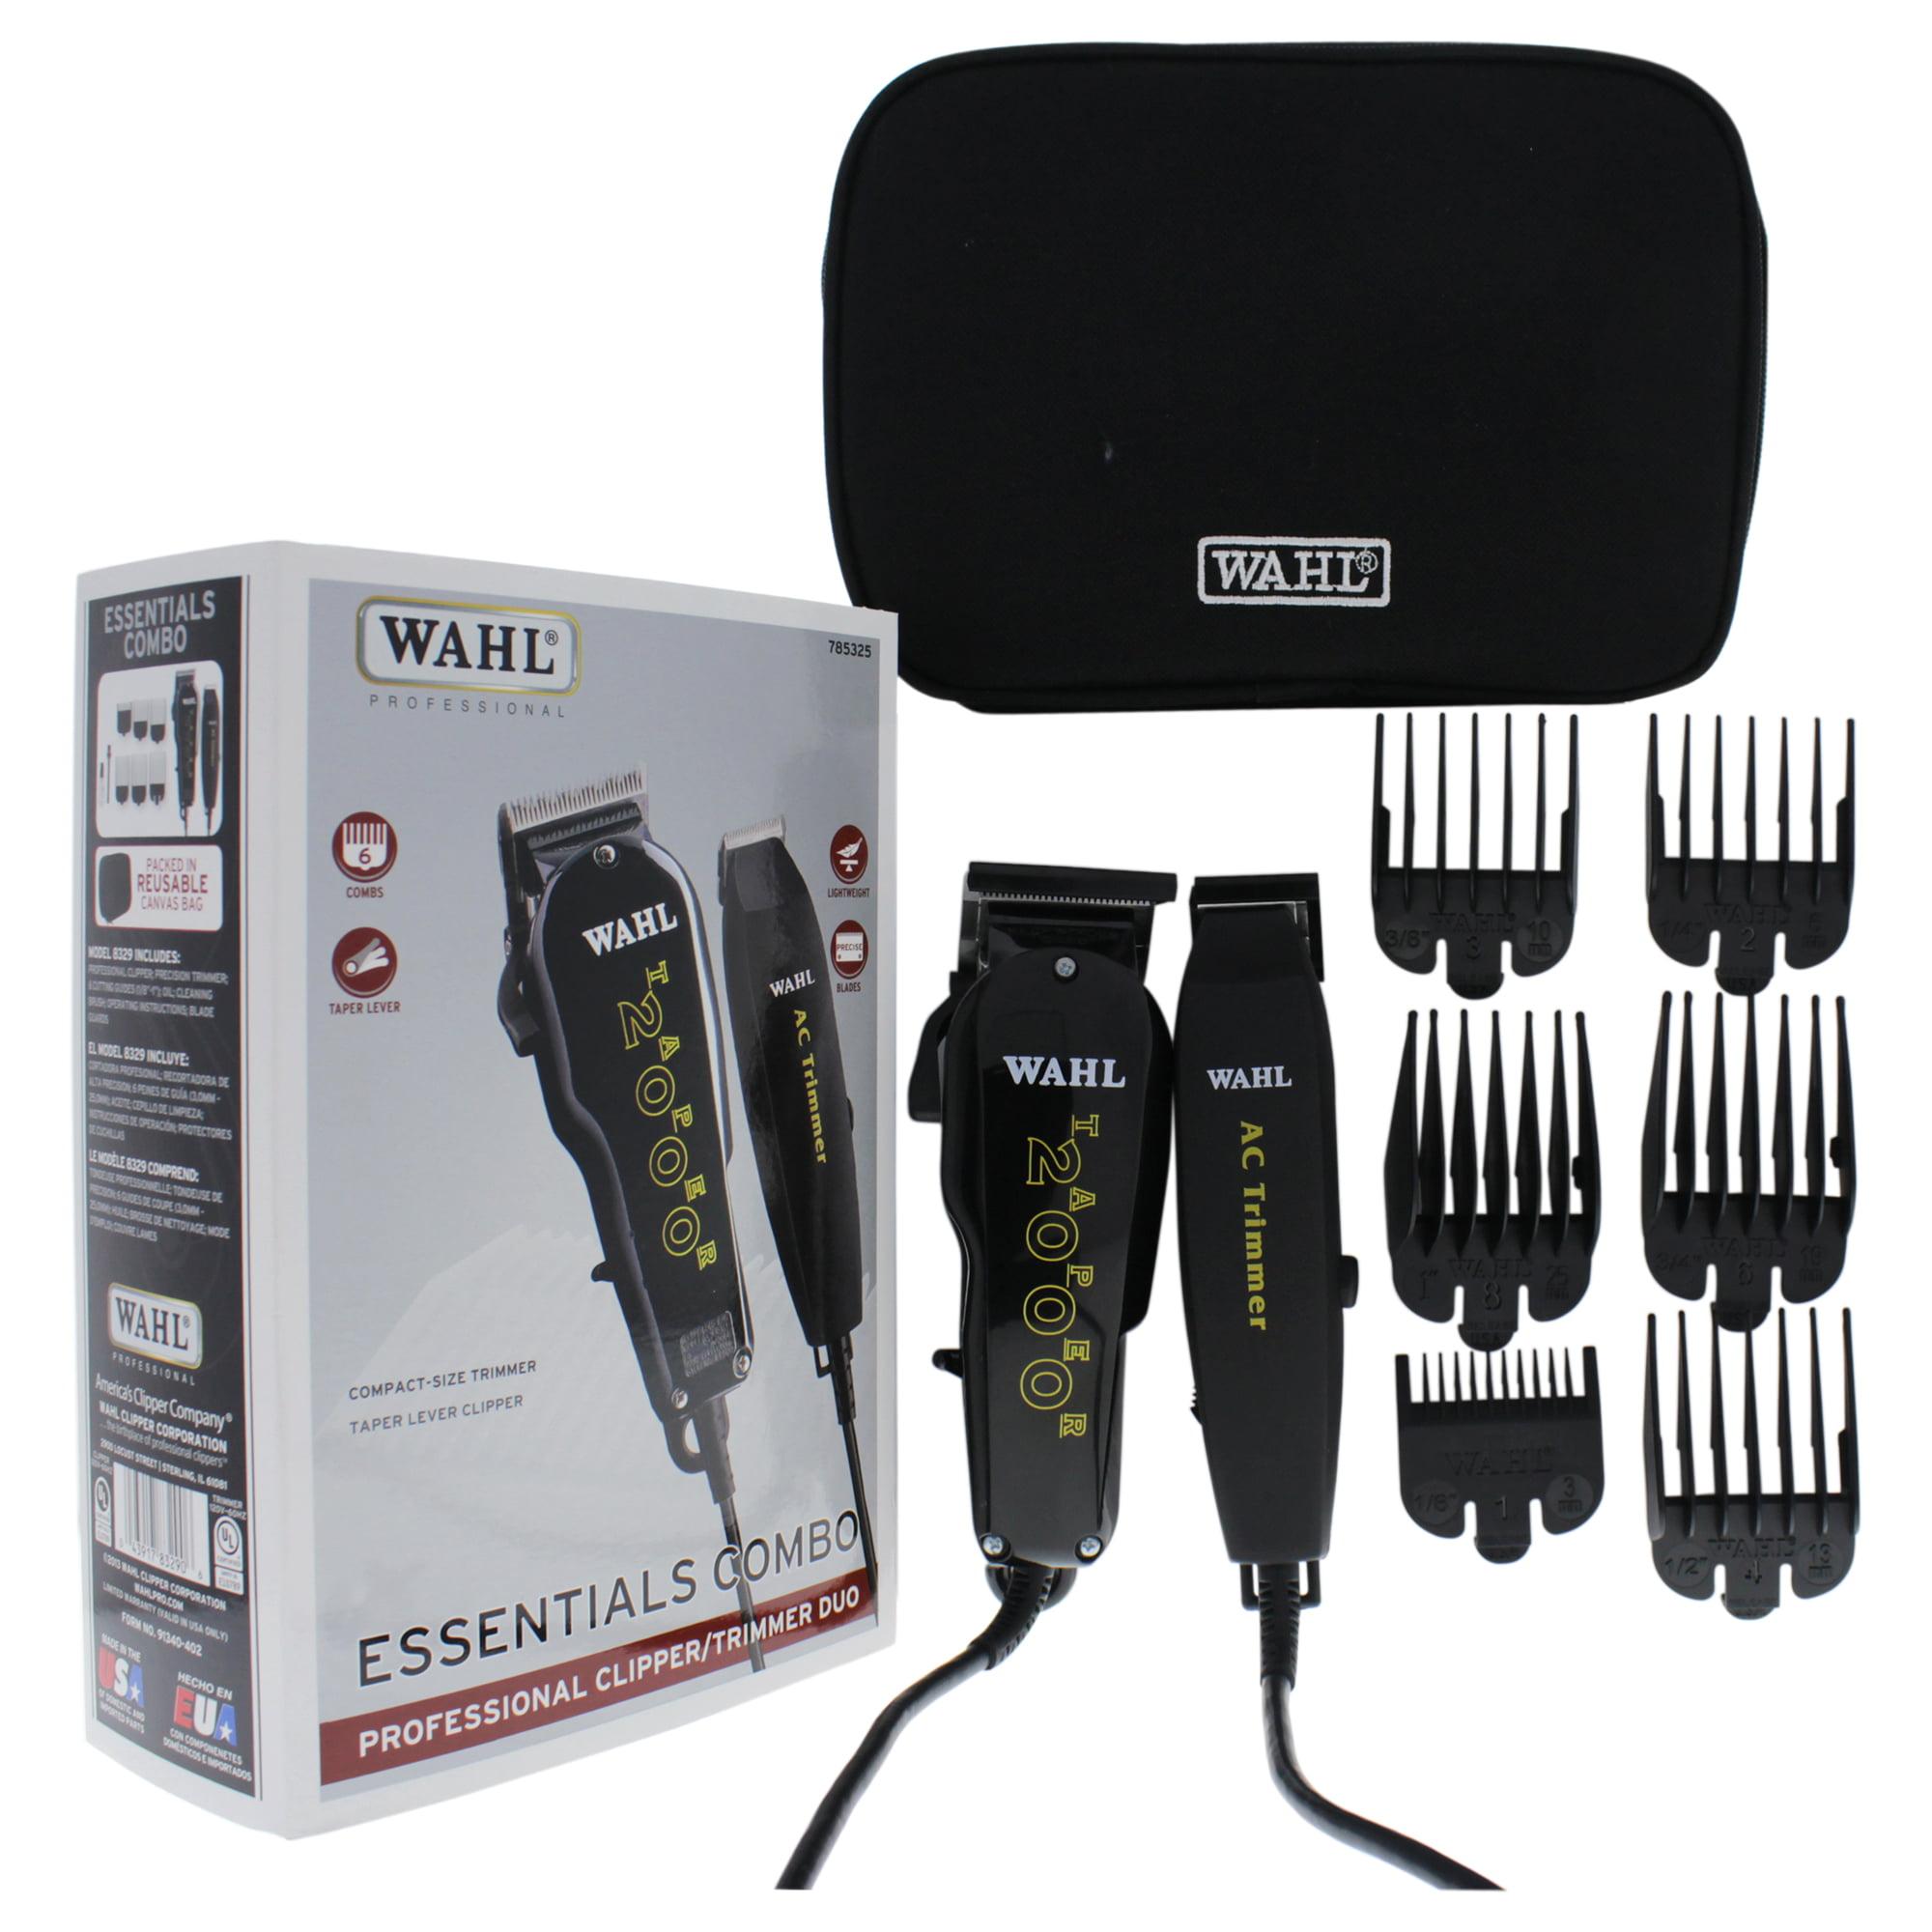 WAHL Professional Essentials Combo Professional Clipper/Trimmer Duo - Model # 8329 - Black - 1 Pc Clipper & Trimmer Combo